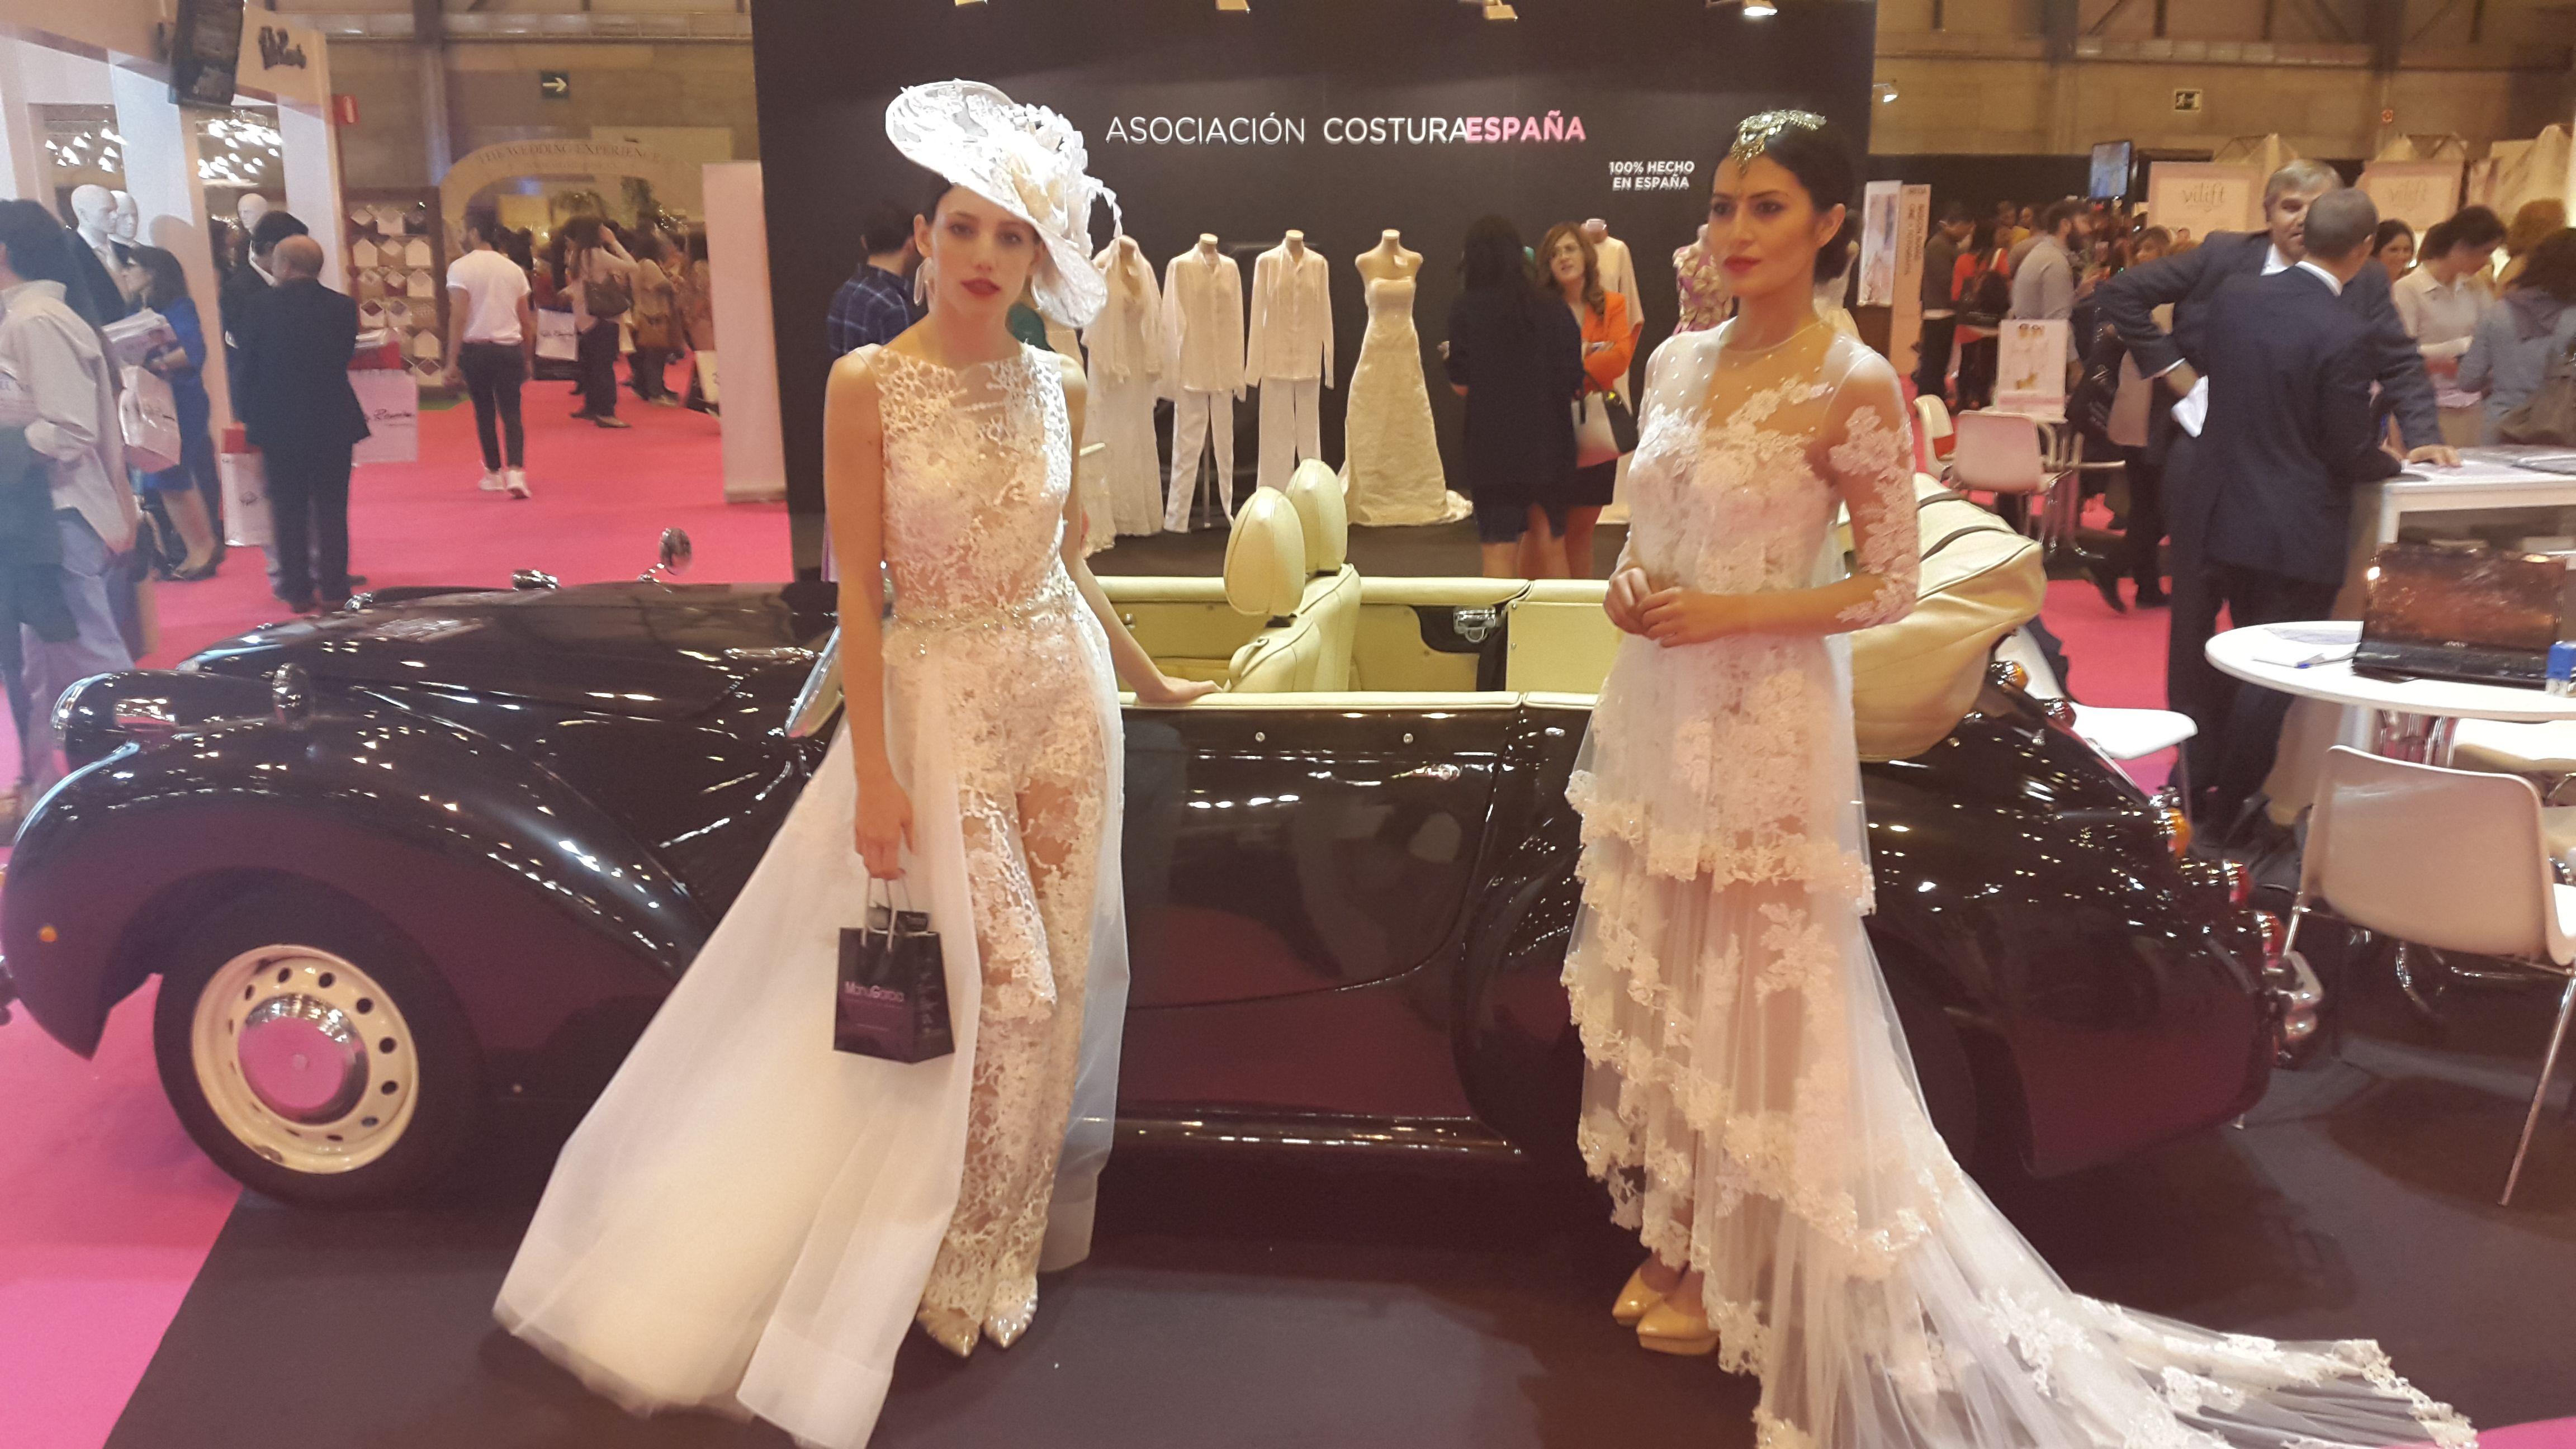 #novia #moda #motor #diseño #MilyunaBodas #MadeinSpain #YoVoya1001bodas